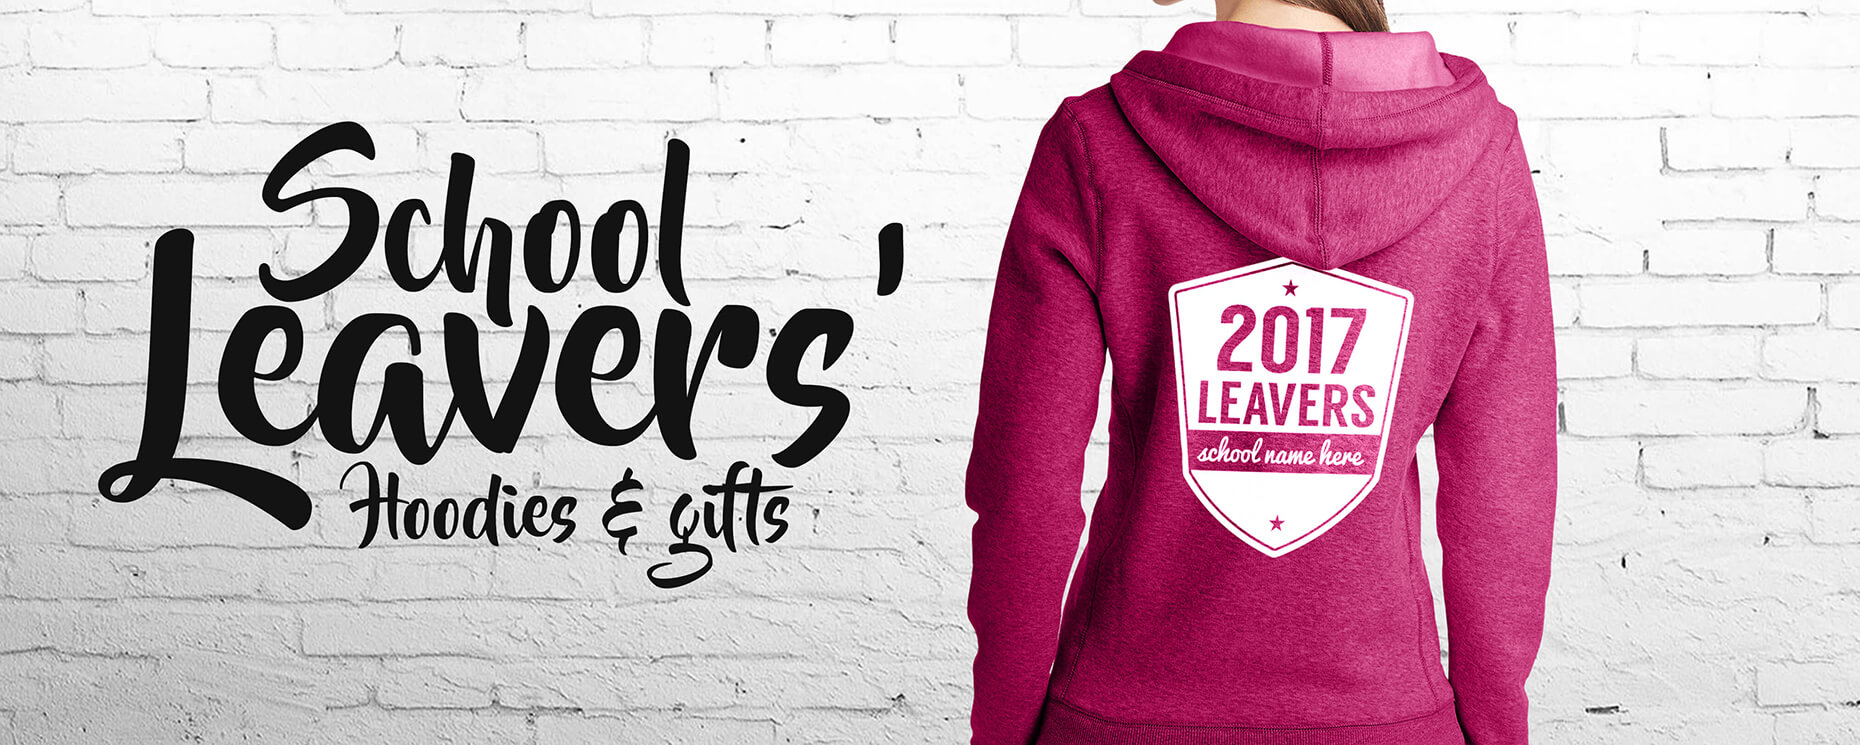 School Leavers Gifts